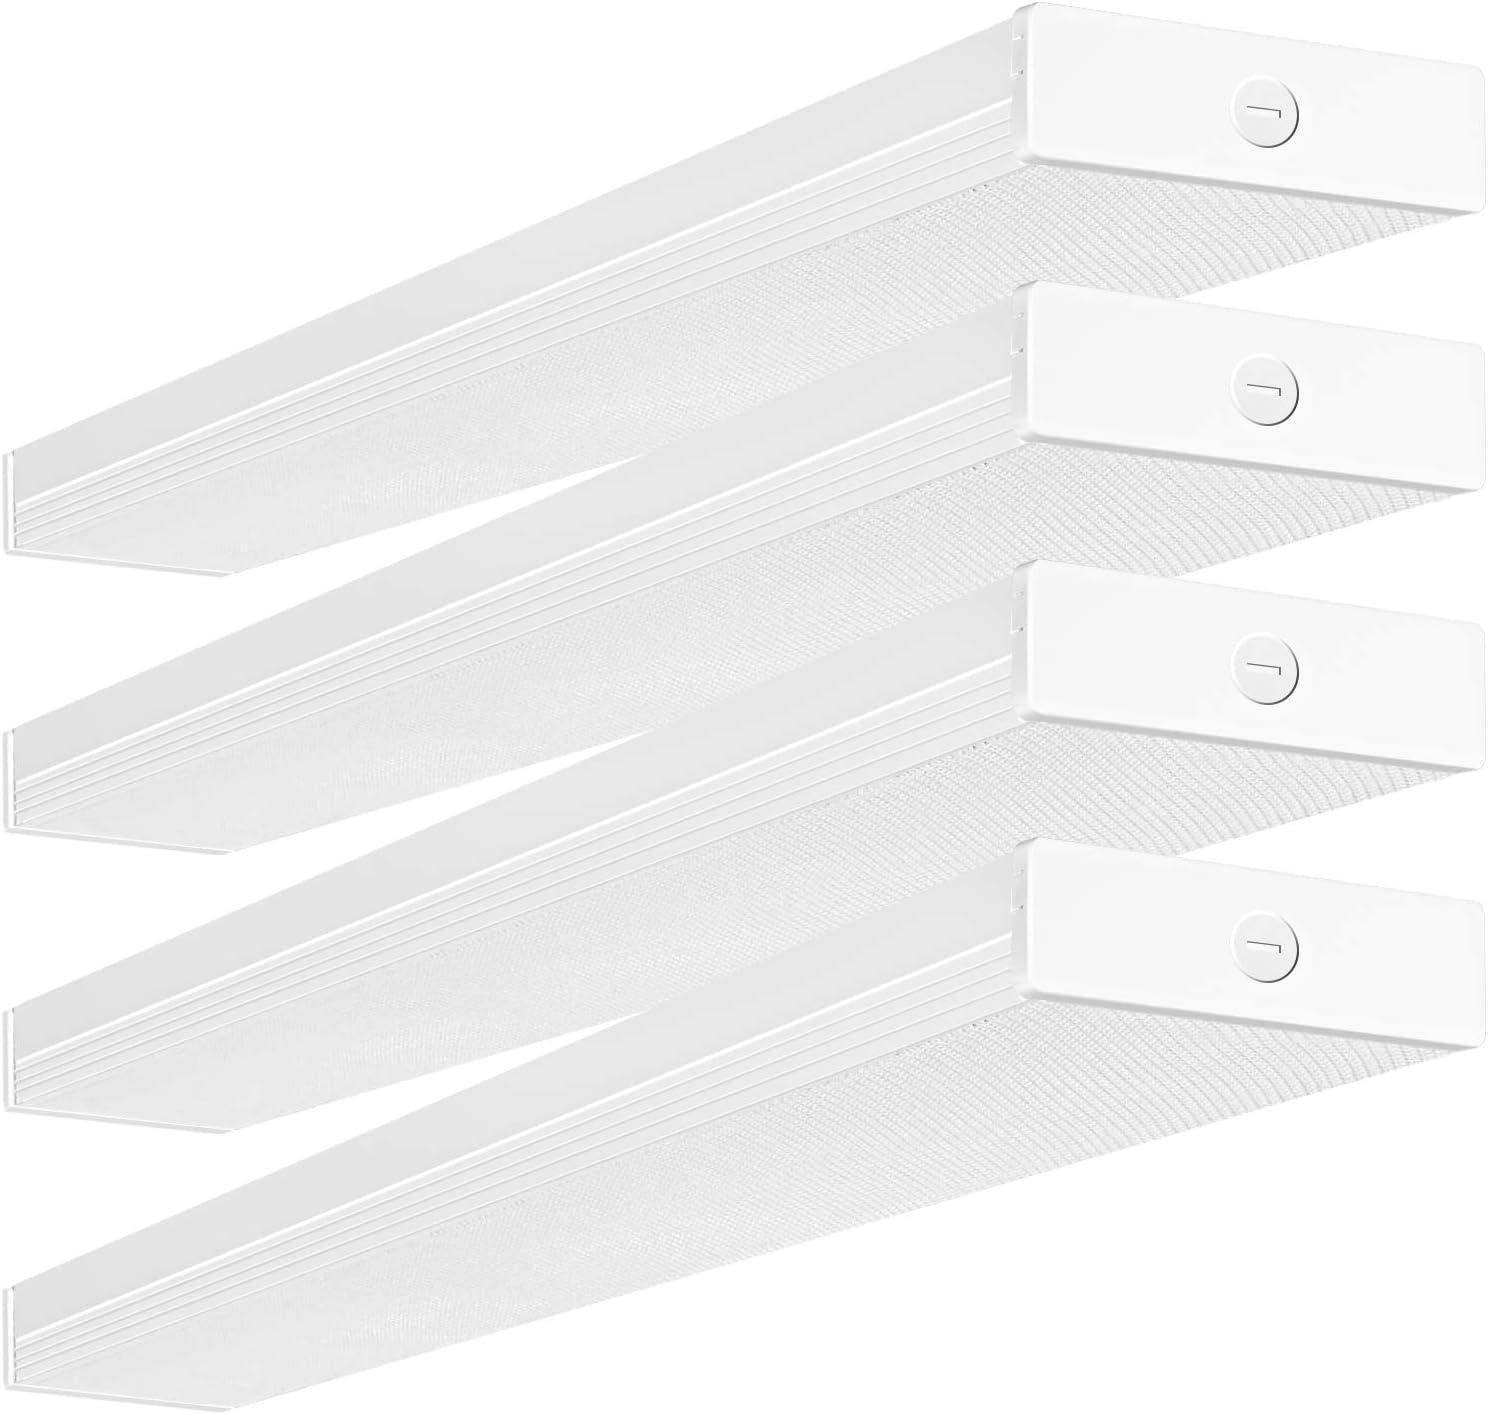 4FT LED Wraparound Light 40W 4 Foot LED Shop Lights for Garage, [2-lamp 32W Fluorescent Equiv.] 4400lm 4000K LED Wrap Light, Flushmount Office Ceiling Light Fixture ETL Listed 4 Pack